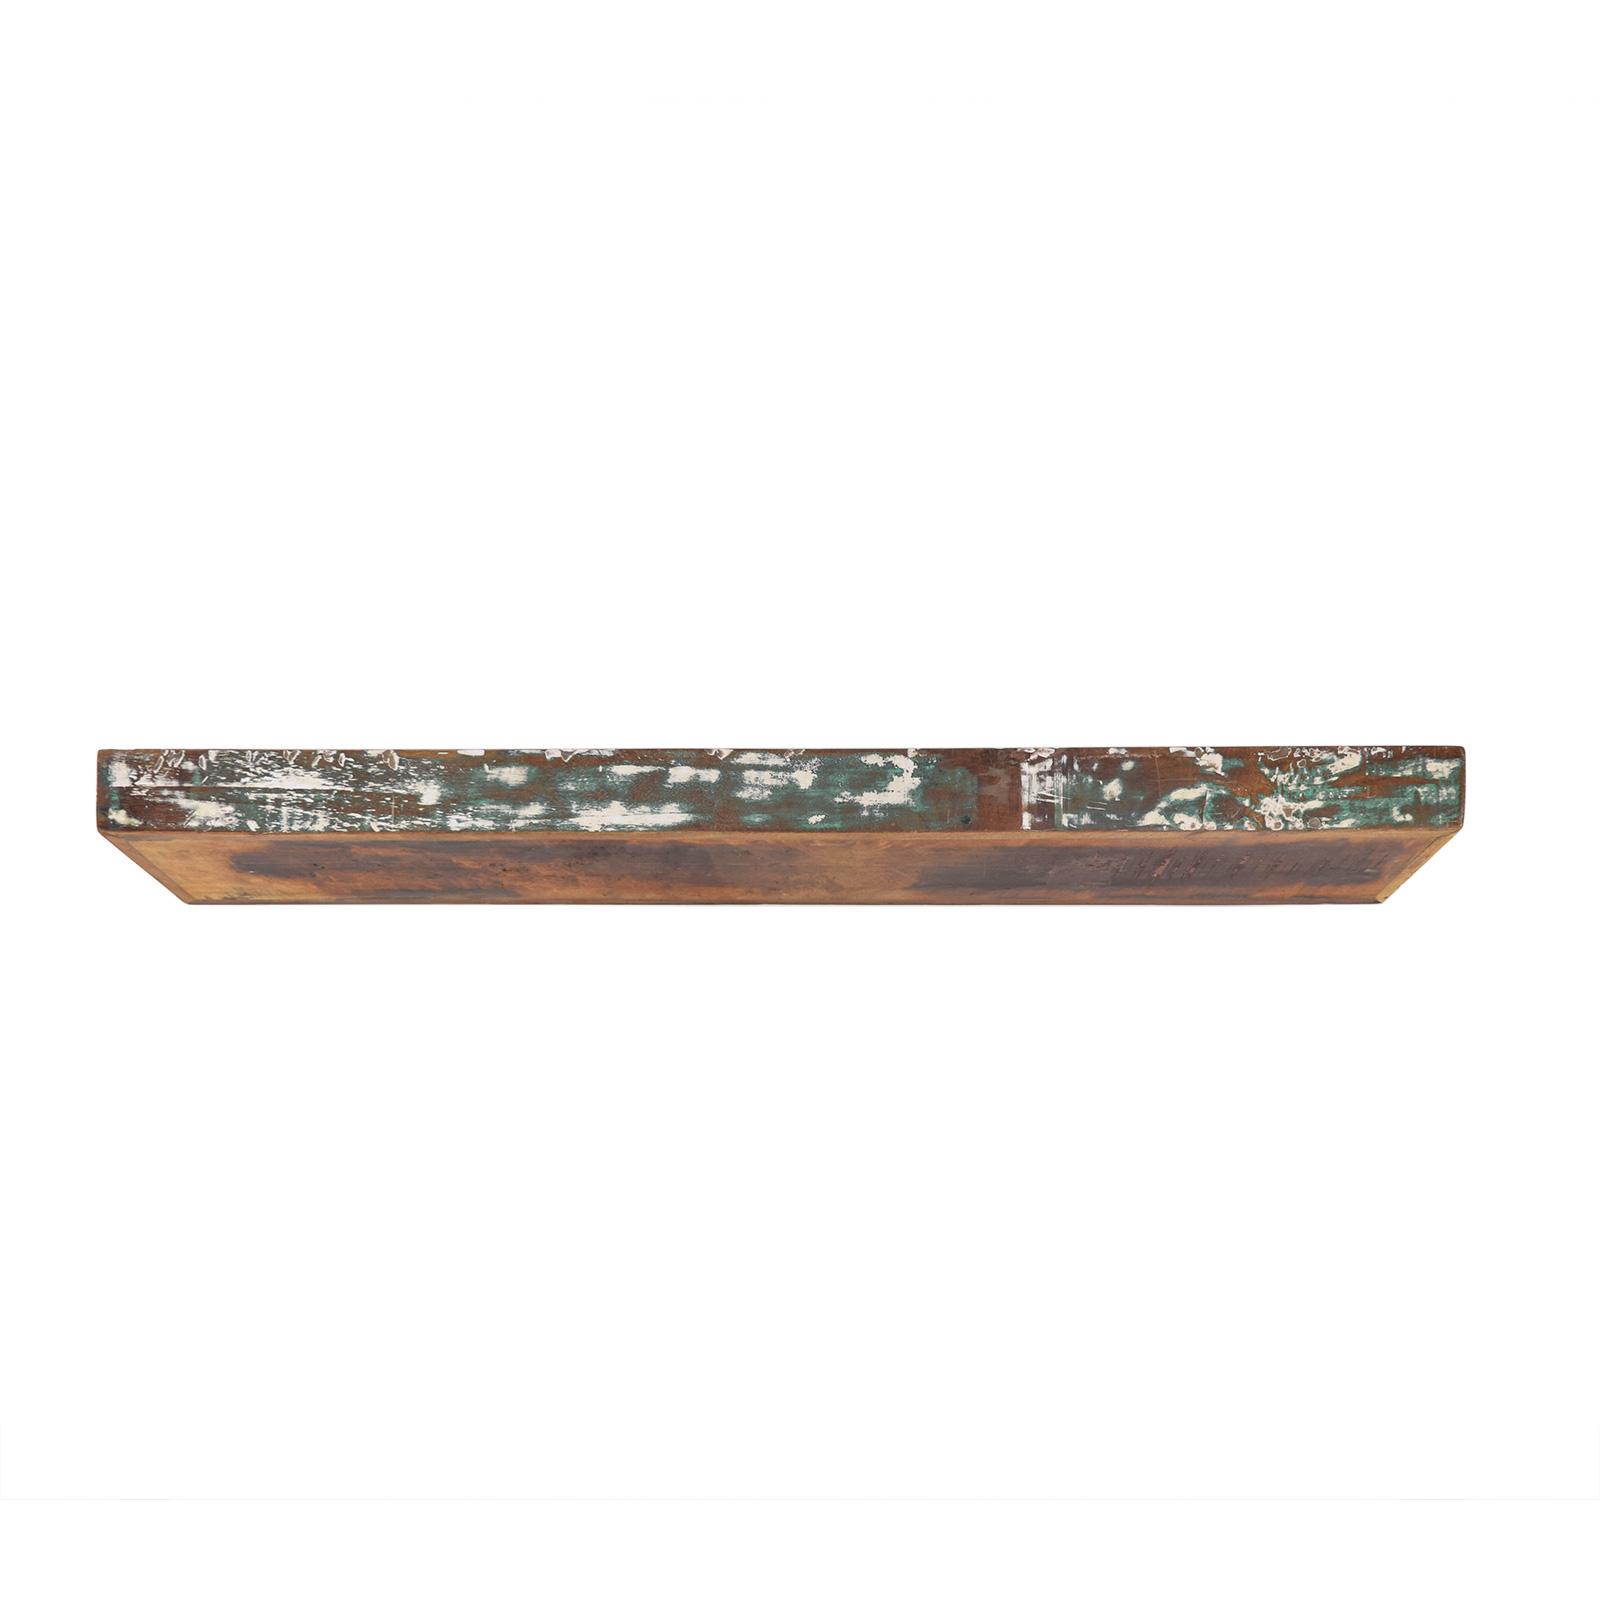 Wandregal Malm aus recyceltem Massivholz 120cm Breit